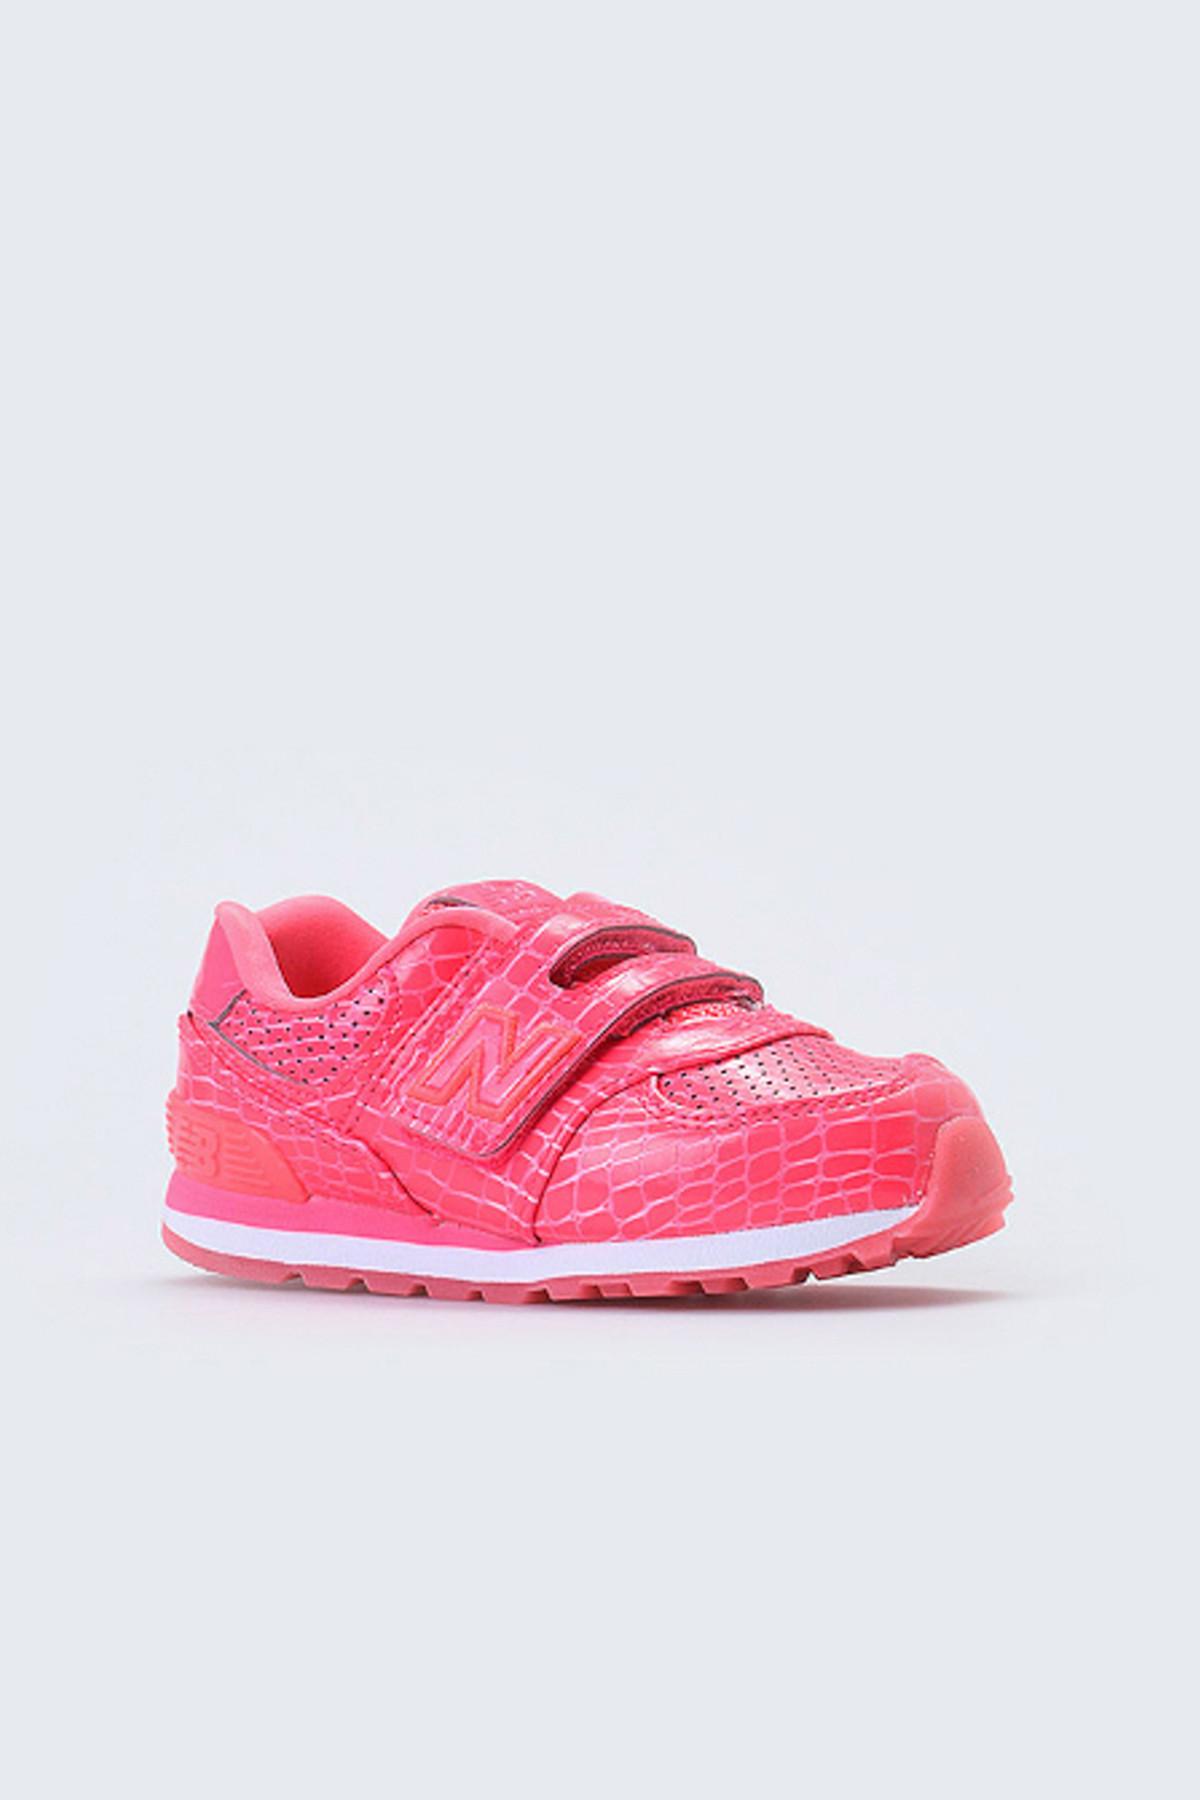 New Balance Pembe Kız Bebek Ayakkabı IV574S5 1